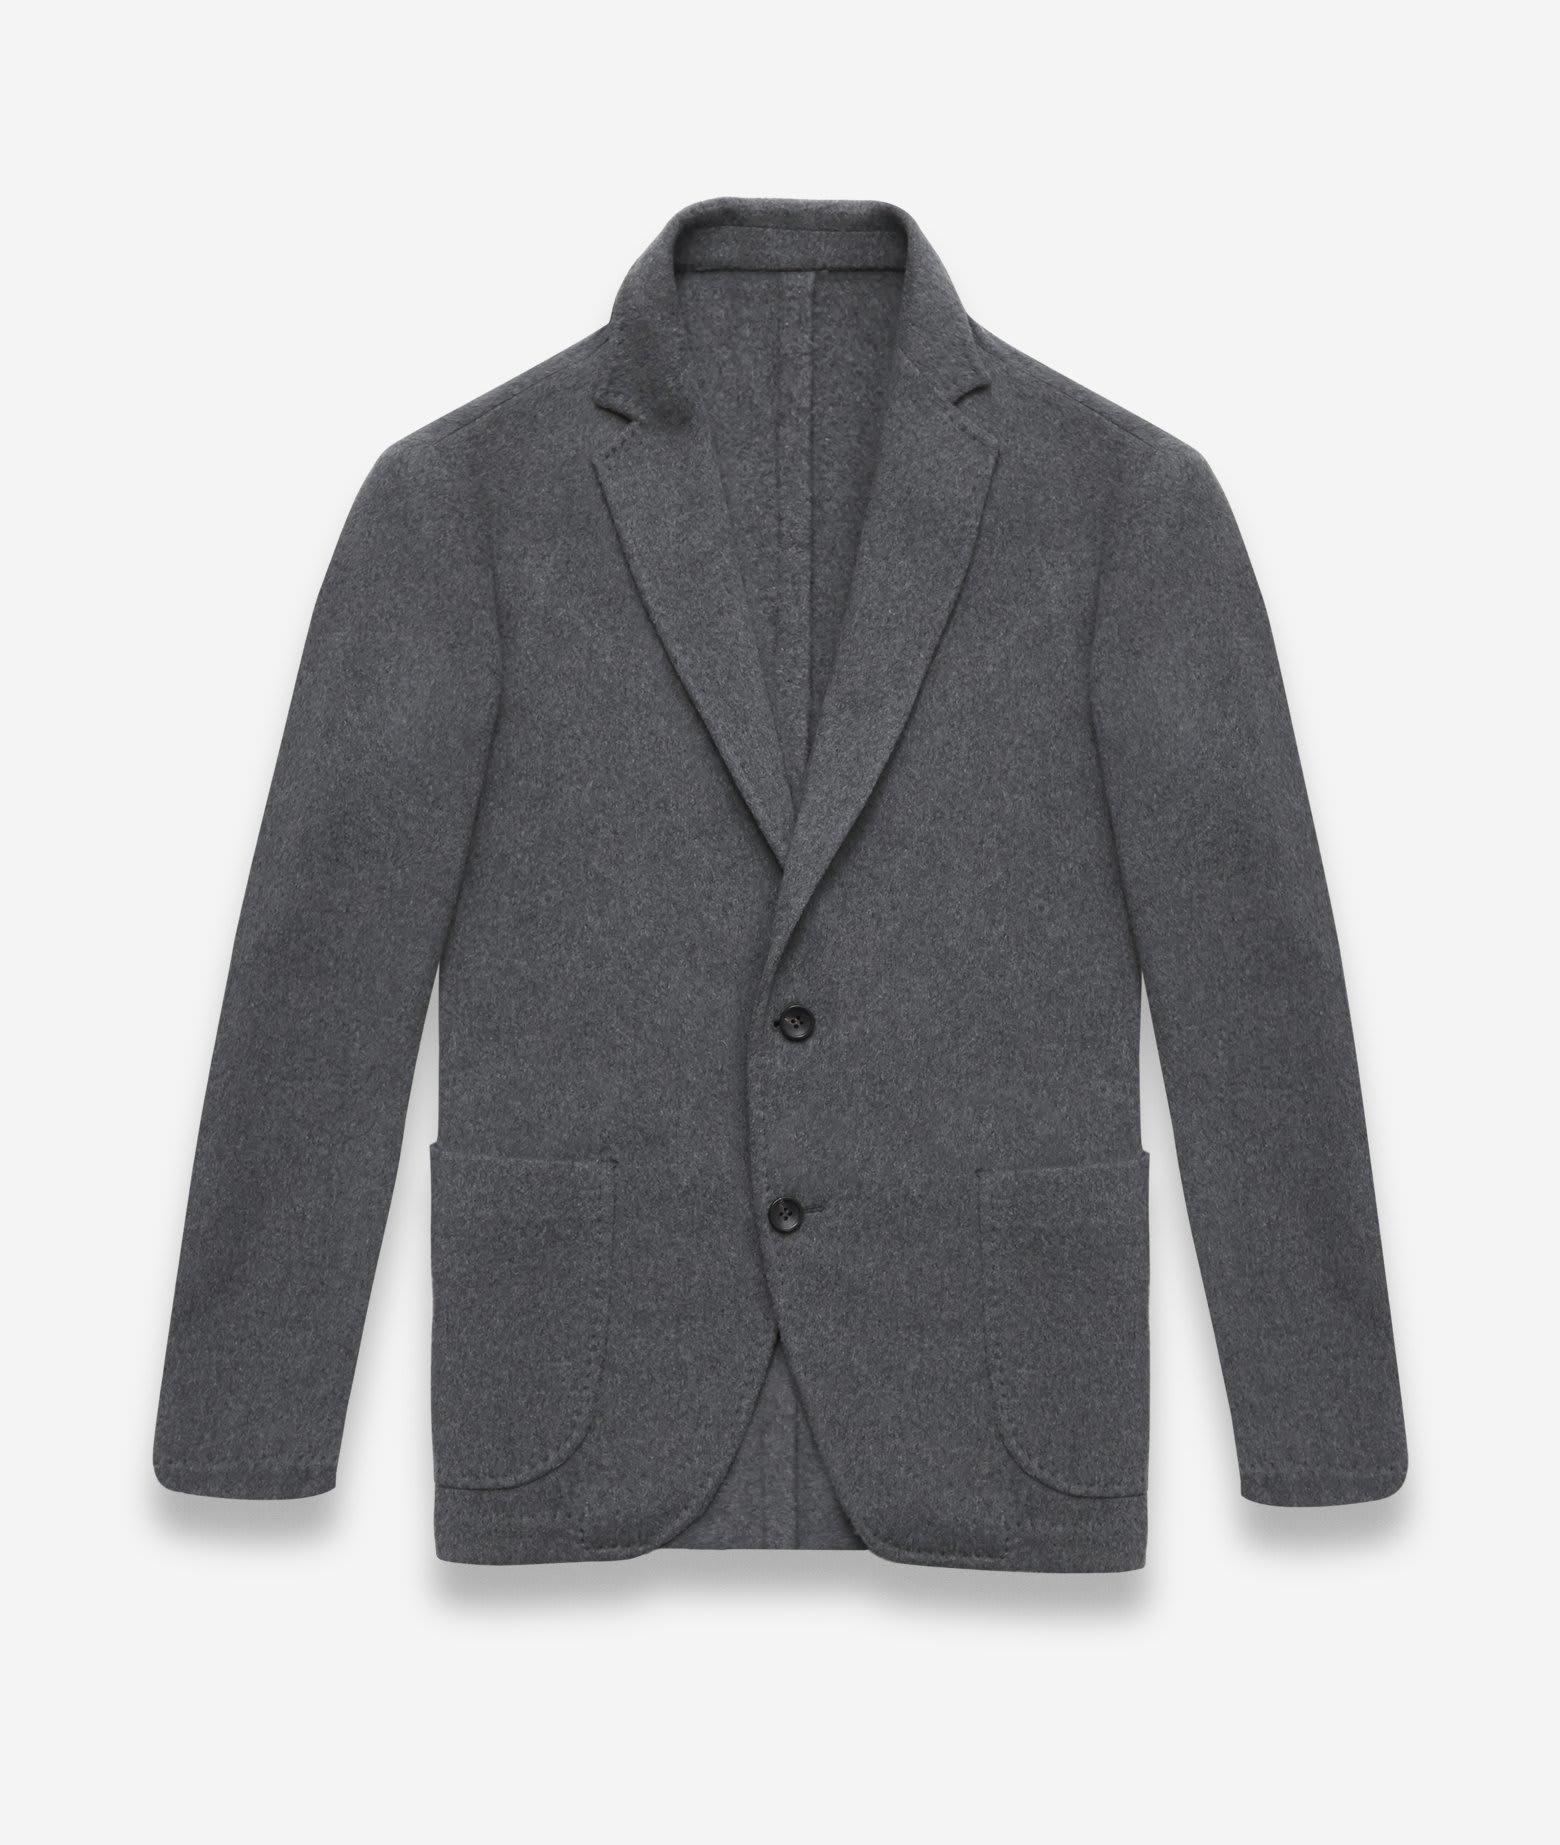 Cashmere Sport Coat whitman